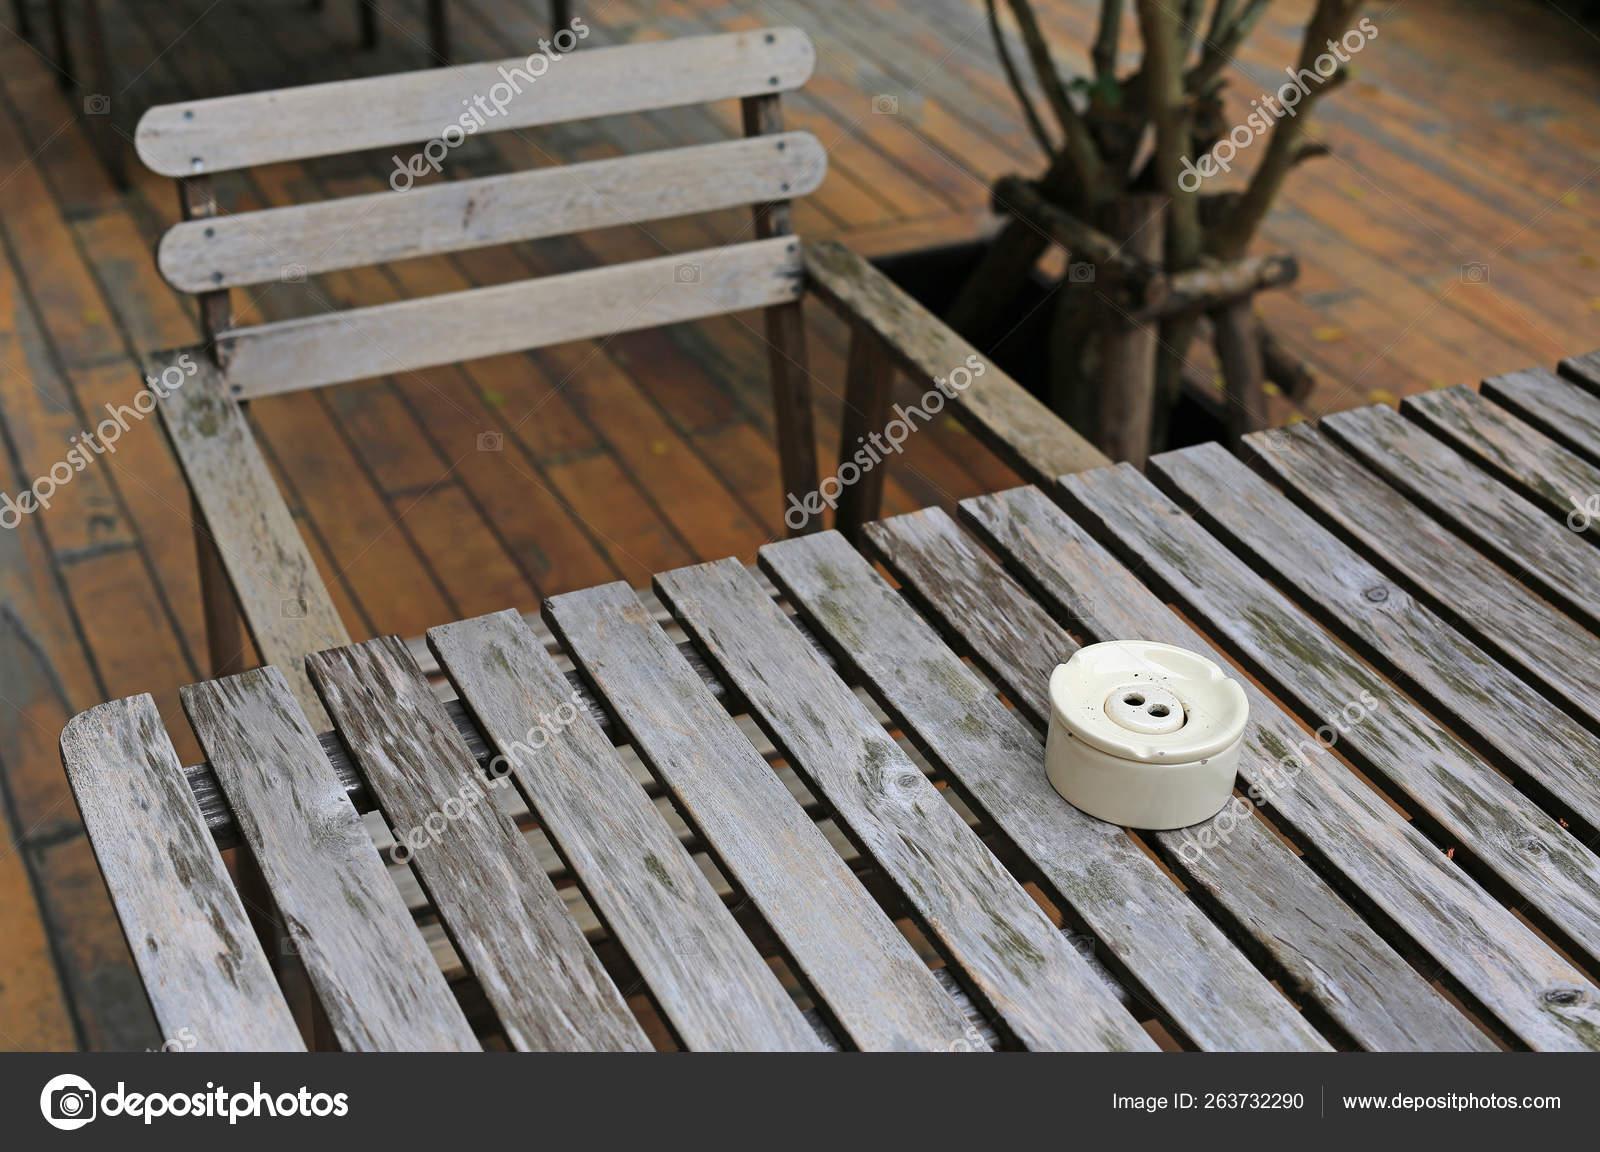 Peachy Wooden Table Chair Garden Ceramic Cigarette Ashtray Stock Spiritservingveterans Wood Chair Design Ideas Spiritservingveteransorg